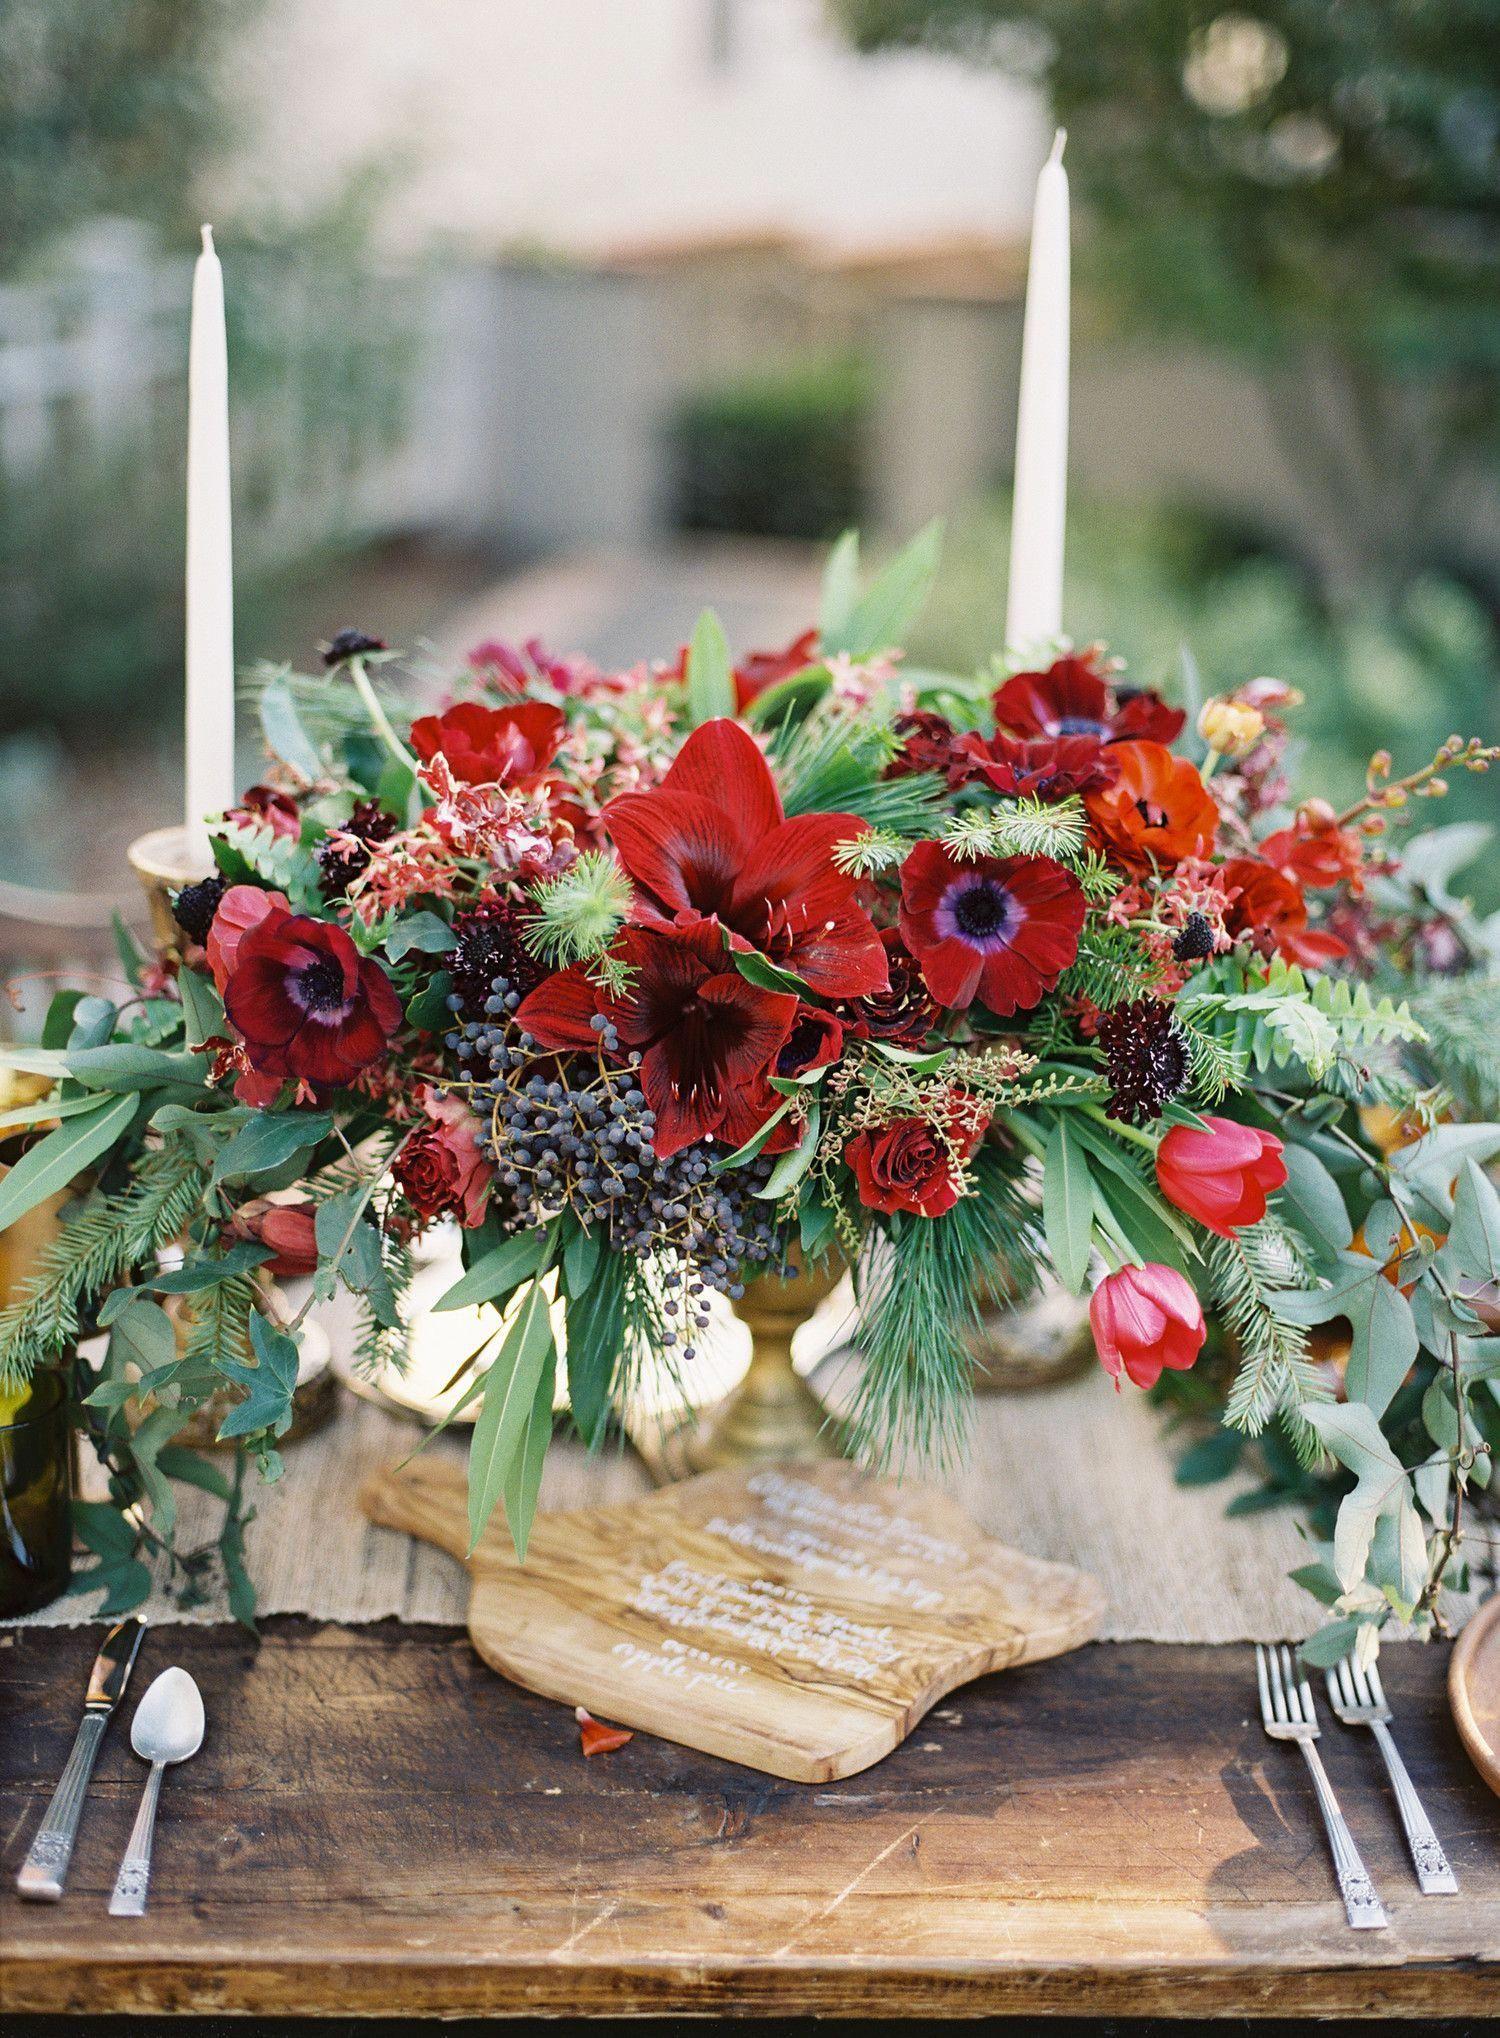 28 Of The Prettiest Rustic Wedding Centerpieces Fall Wedding Centerpieces Fall Wedding Decorations Diy Fall Wedding Centerpieces